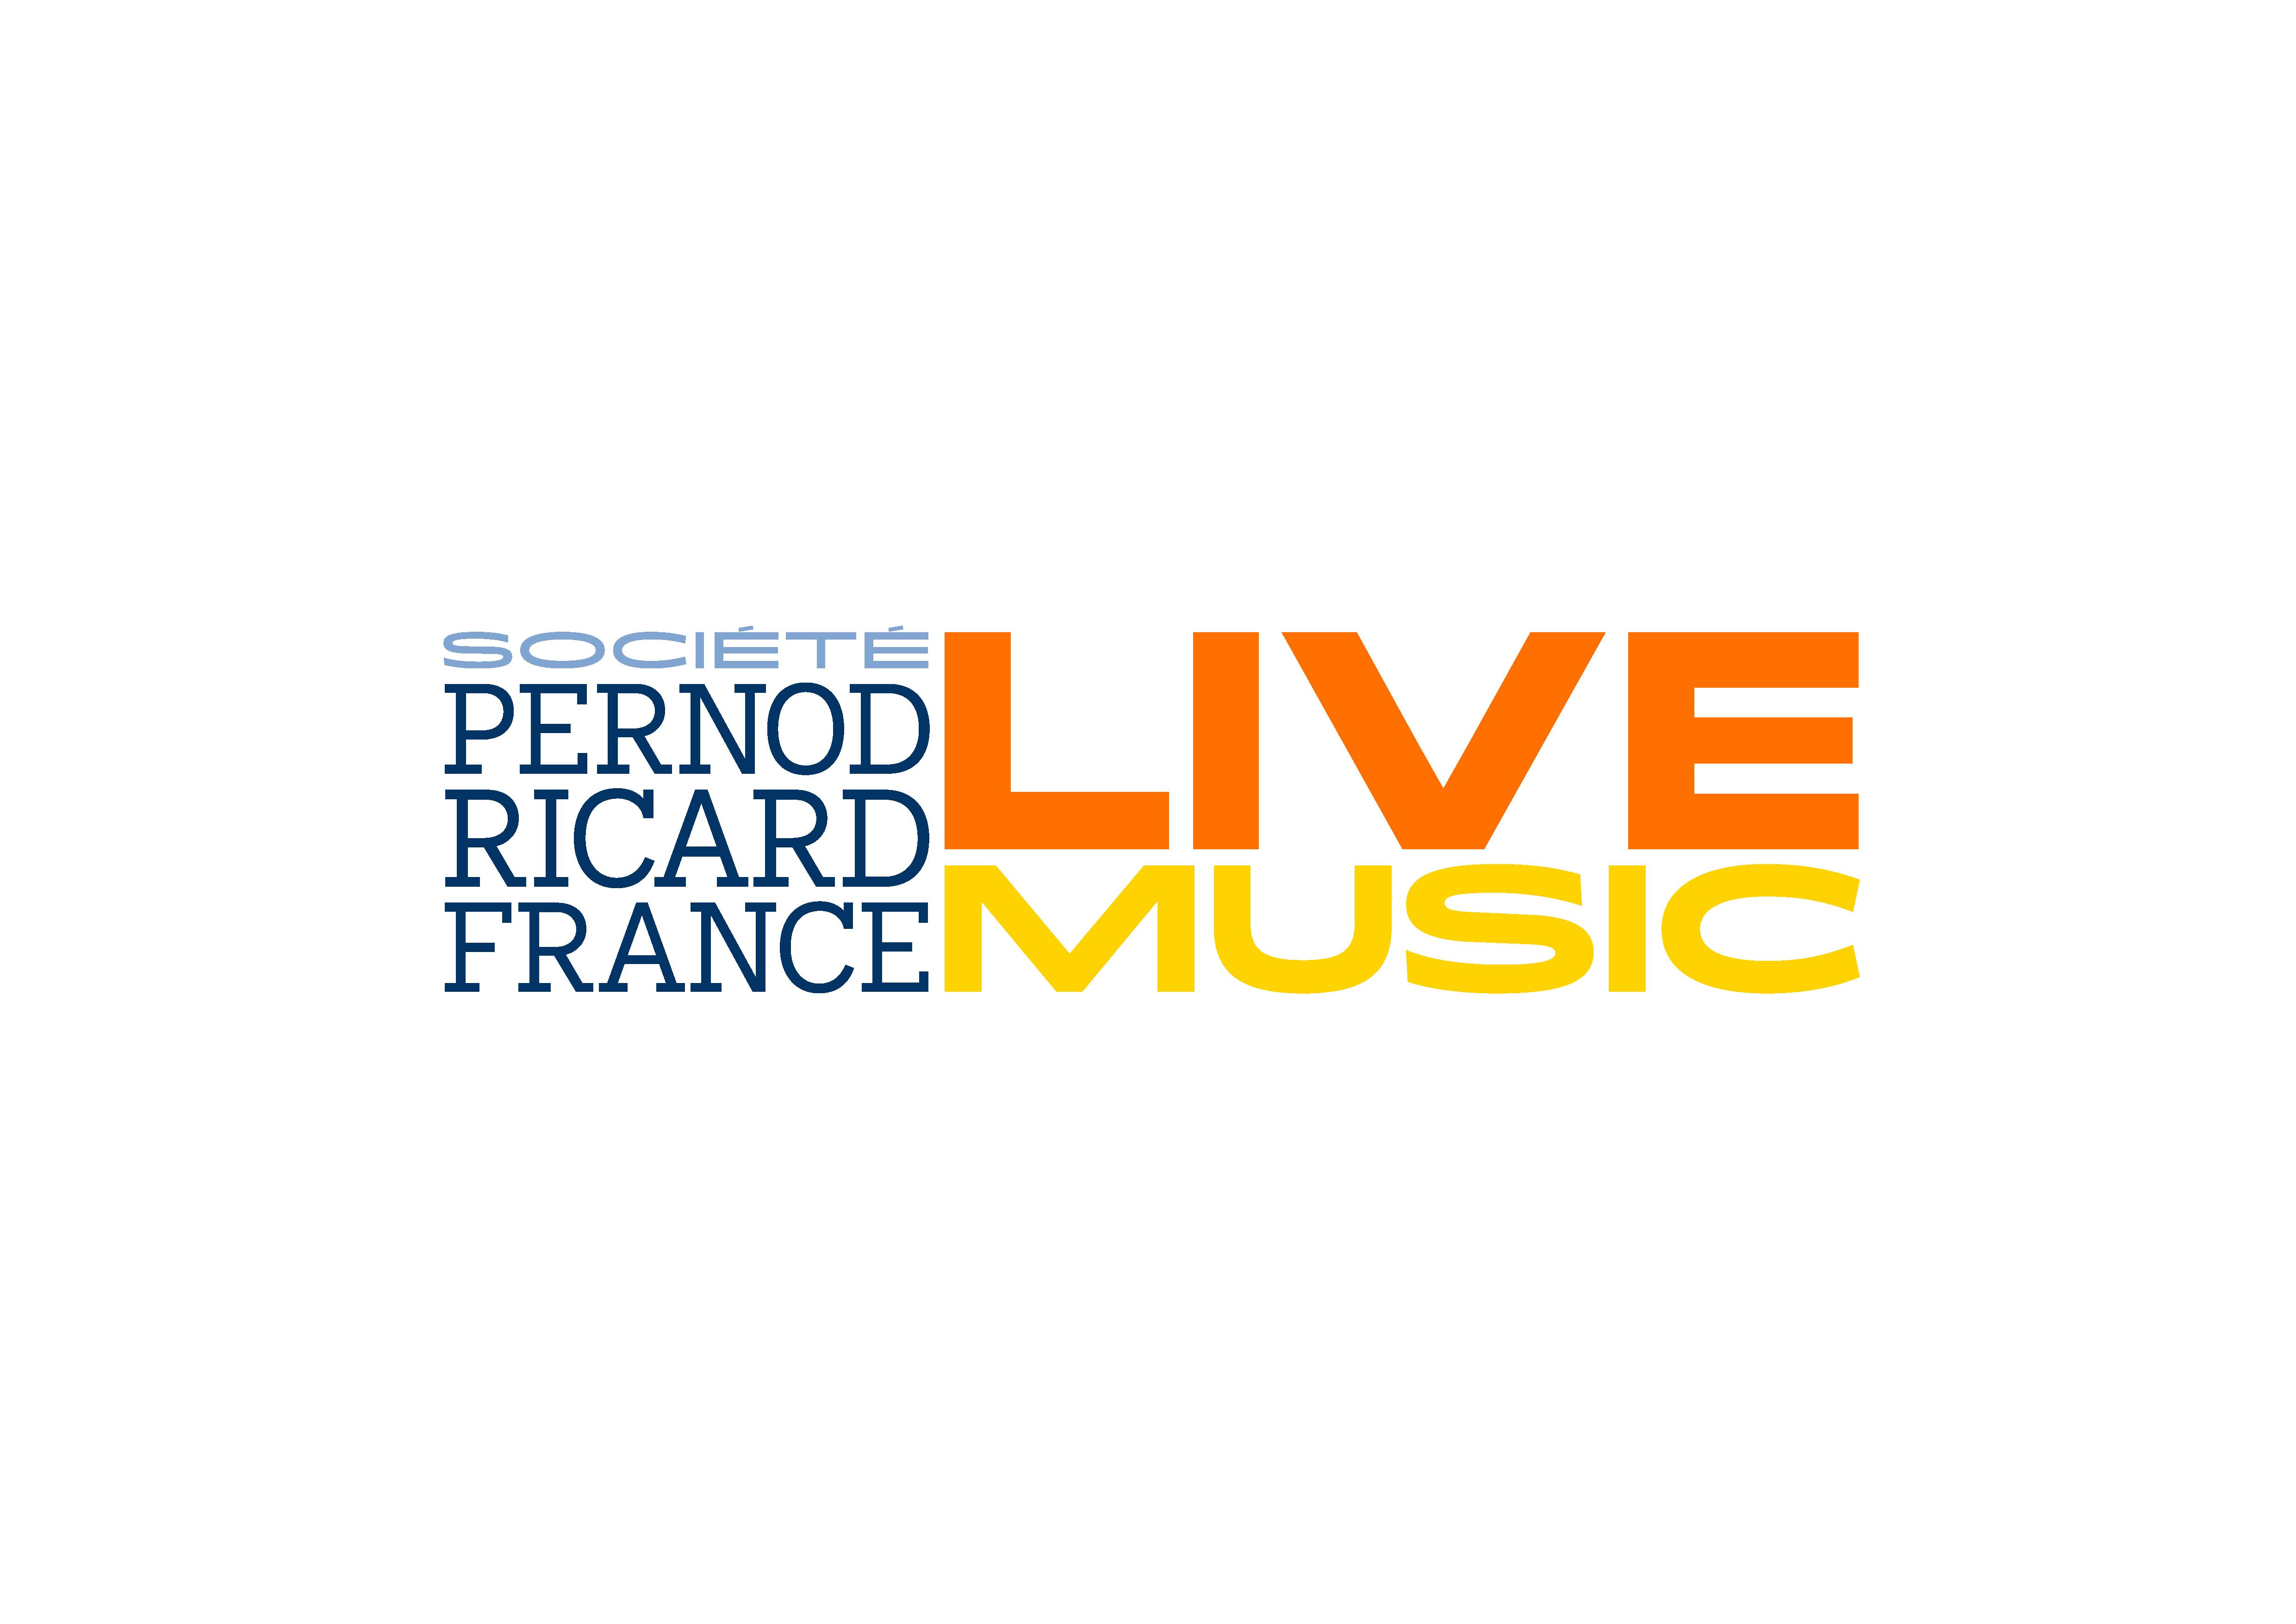 SOCIETE PERNOD RICARD FRANCE LIVE MUSIC